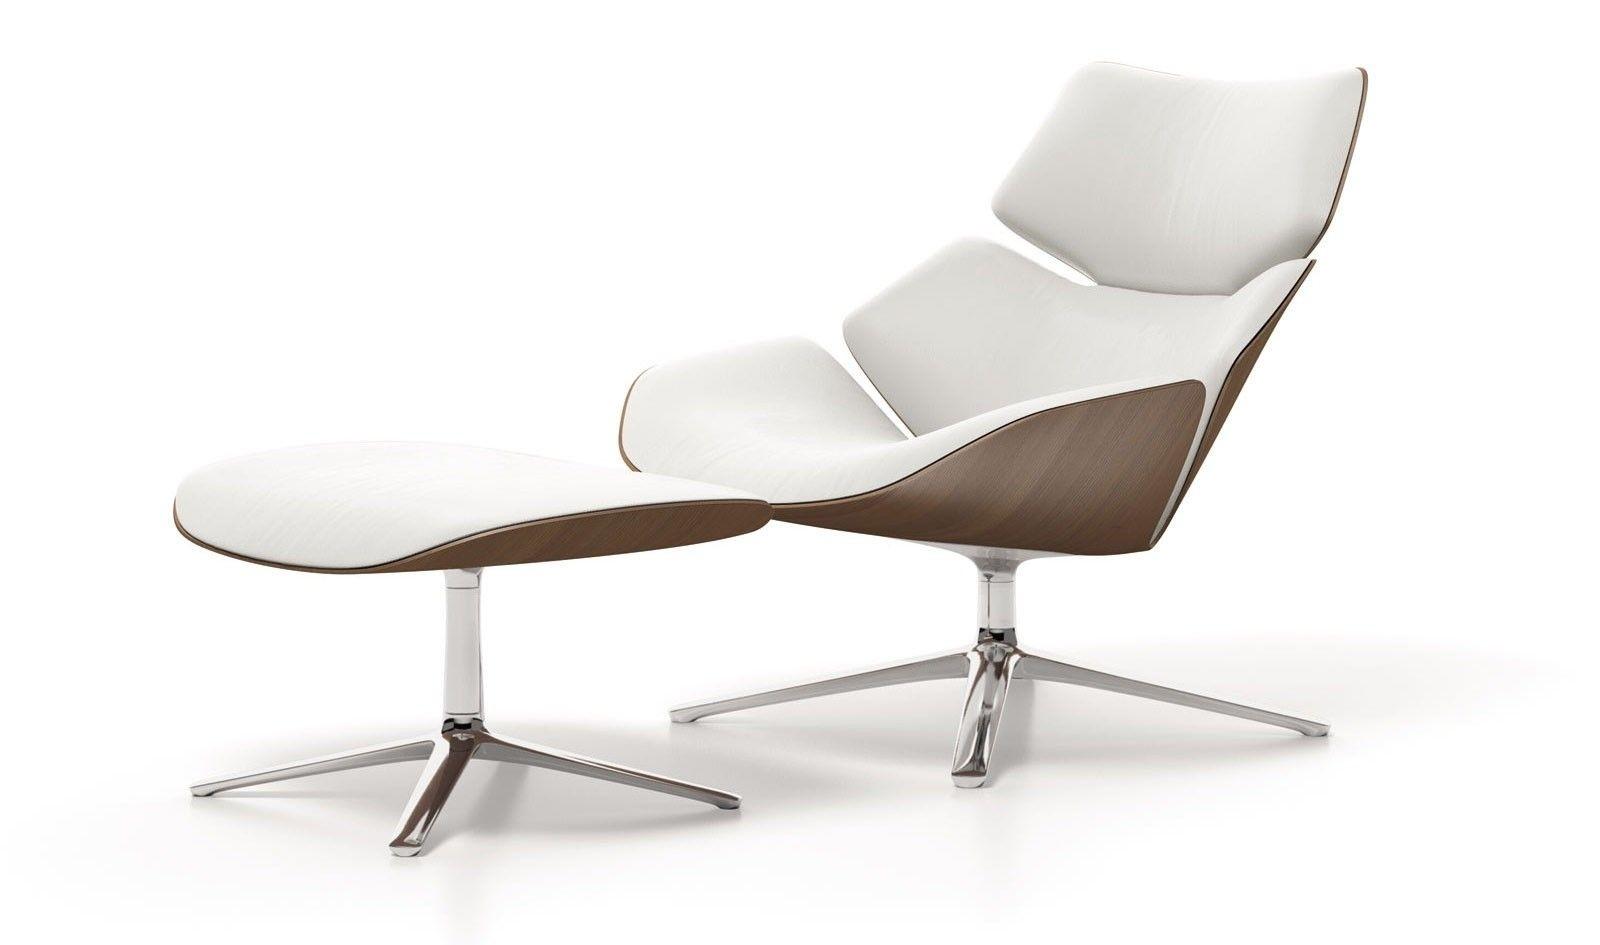 Beau Modern Recliner Chairs